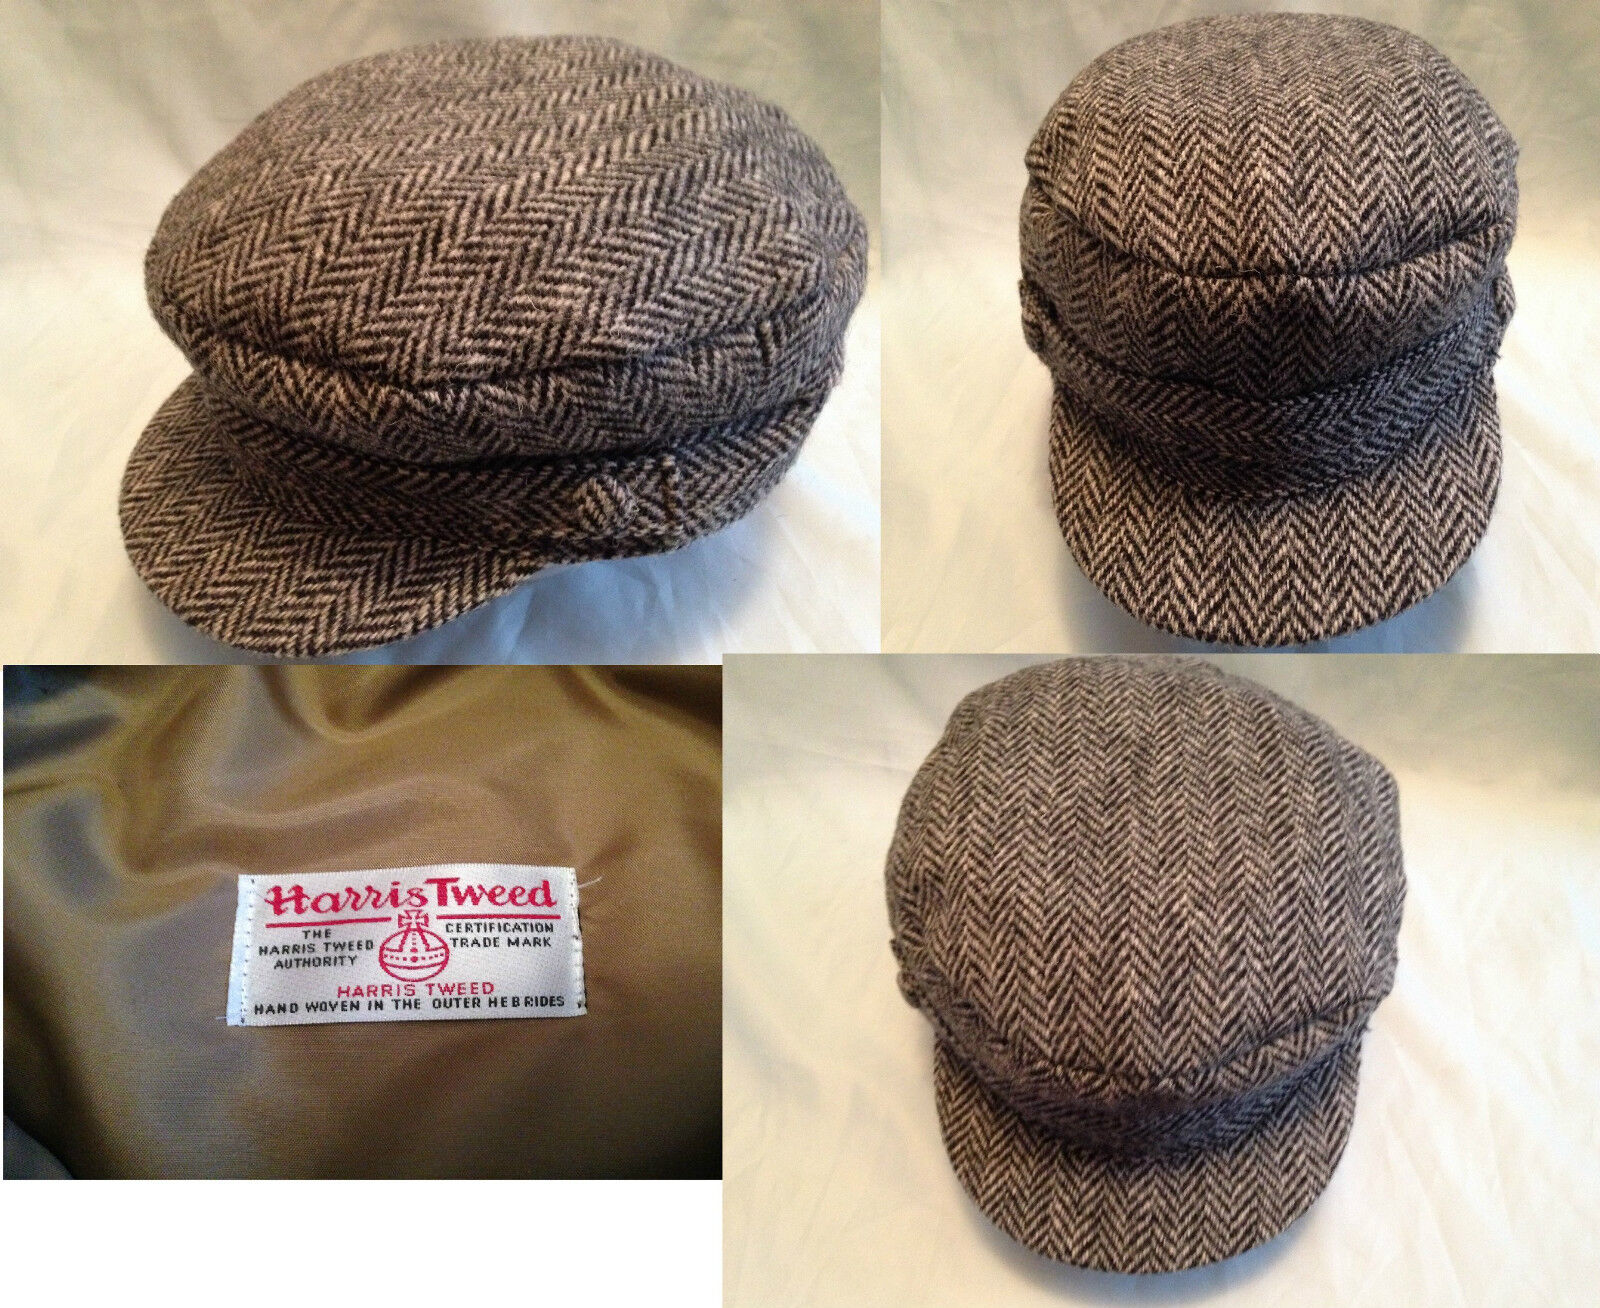 HARRIS TWEED GREY HERRINGBONE BRETON SAILING BARGE CASTRO  FIDDLER  SAILOR CAP  select from the newest brands like